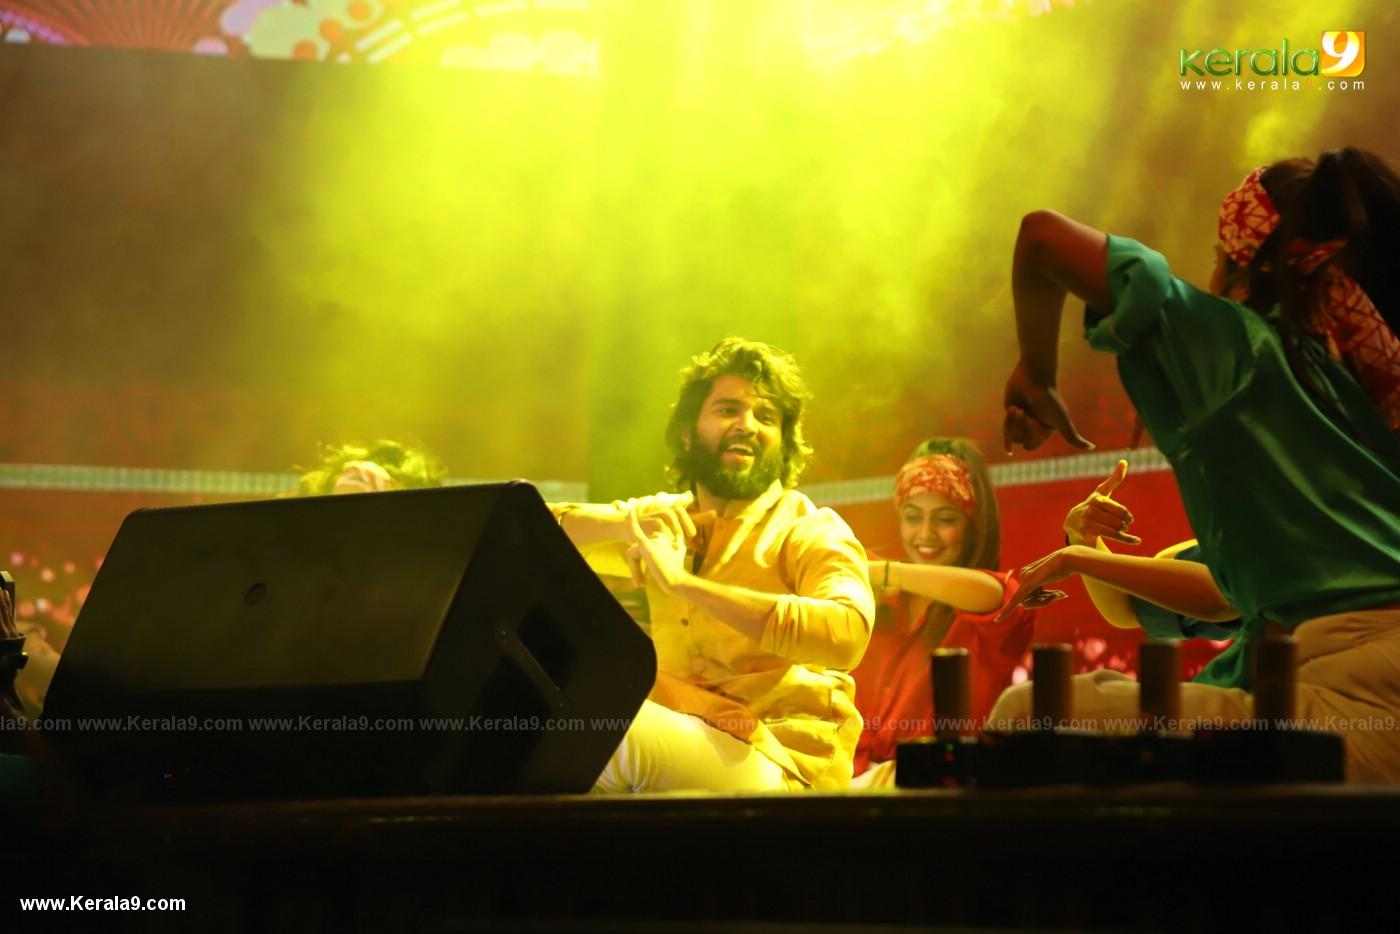 Dear Comrade movie premotion kerala kochi photos 113 - Kerala9.com